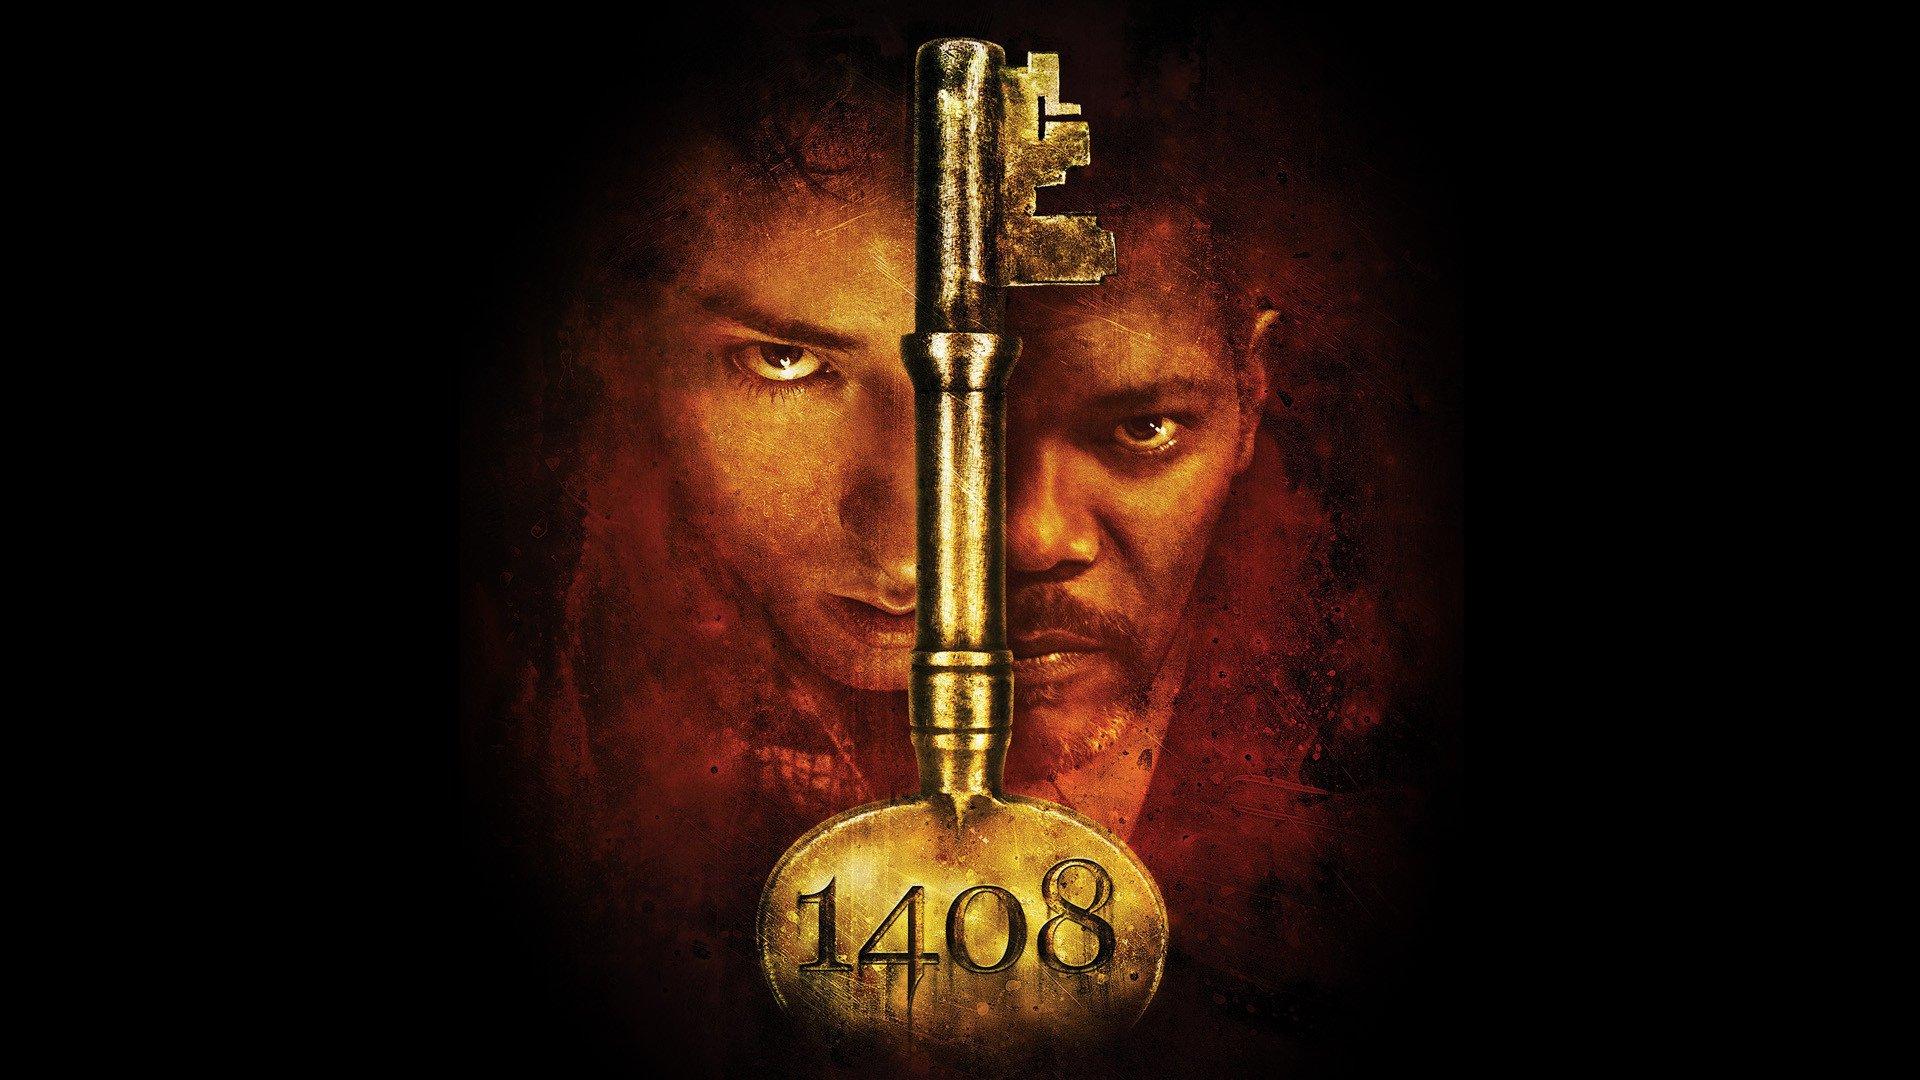 Chambre 1408 films for Chambre 1408 bande annonce vf